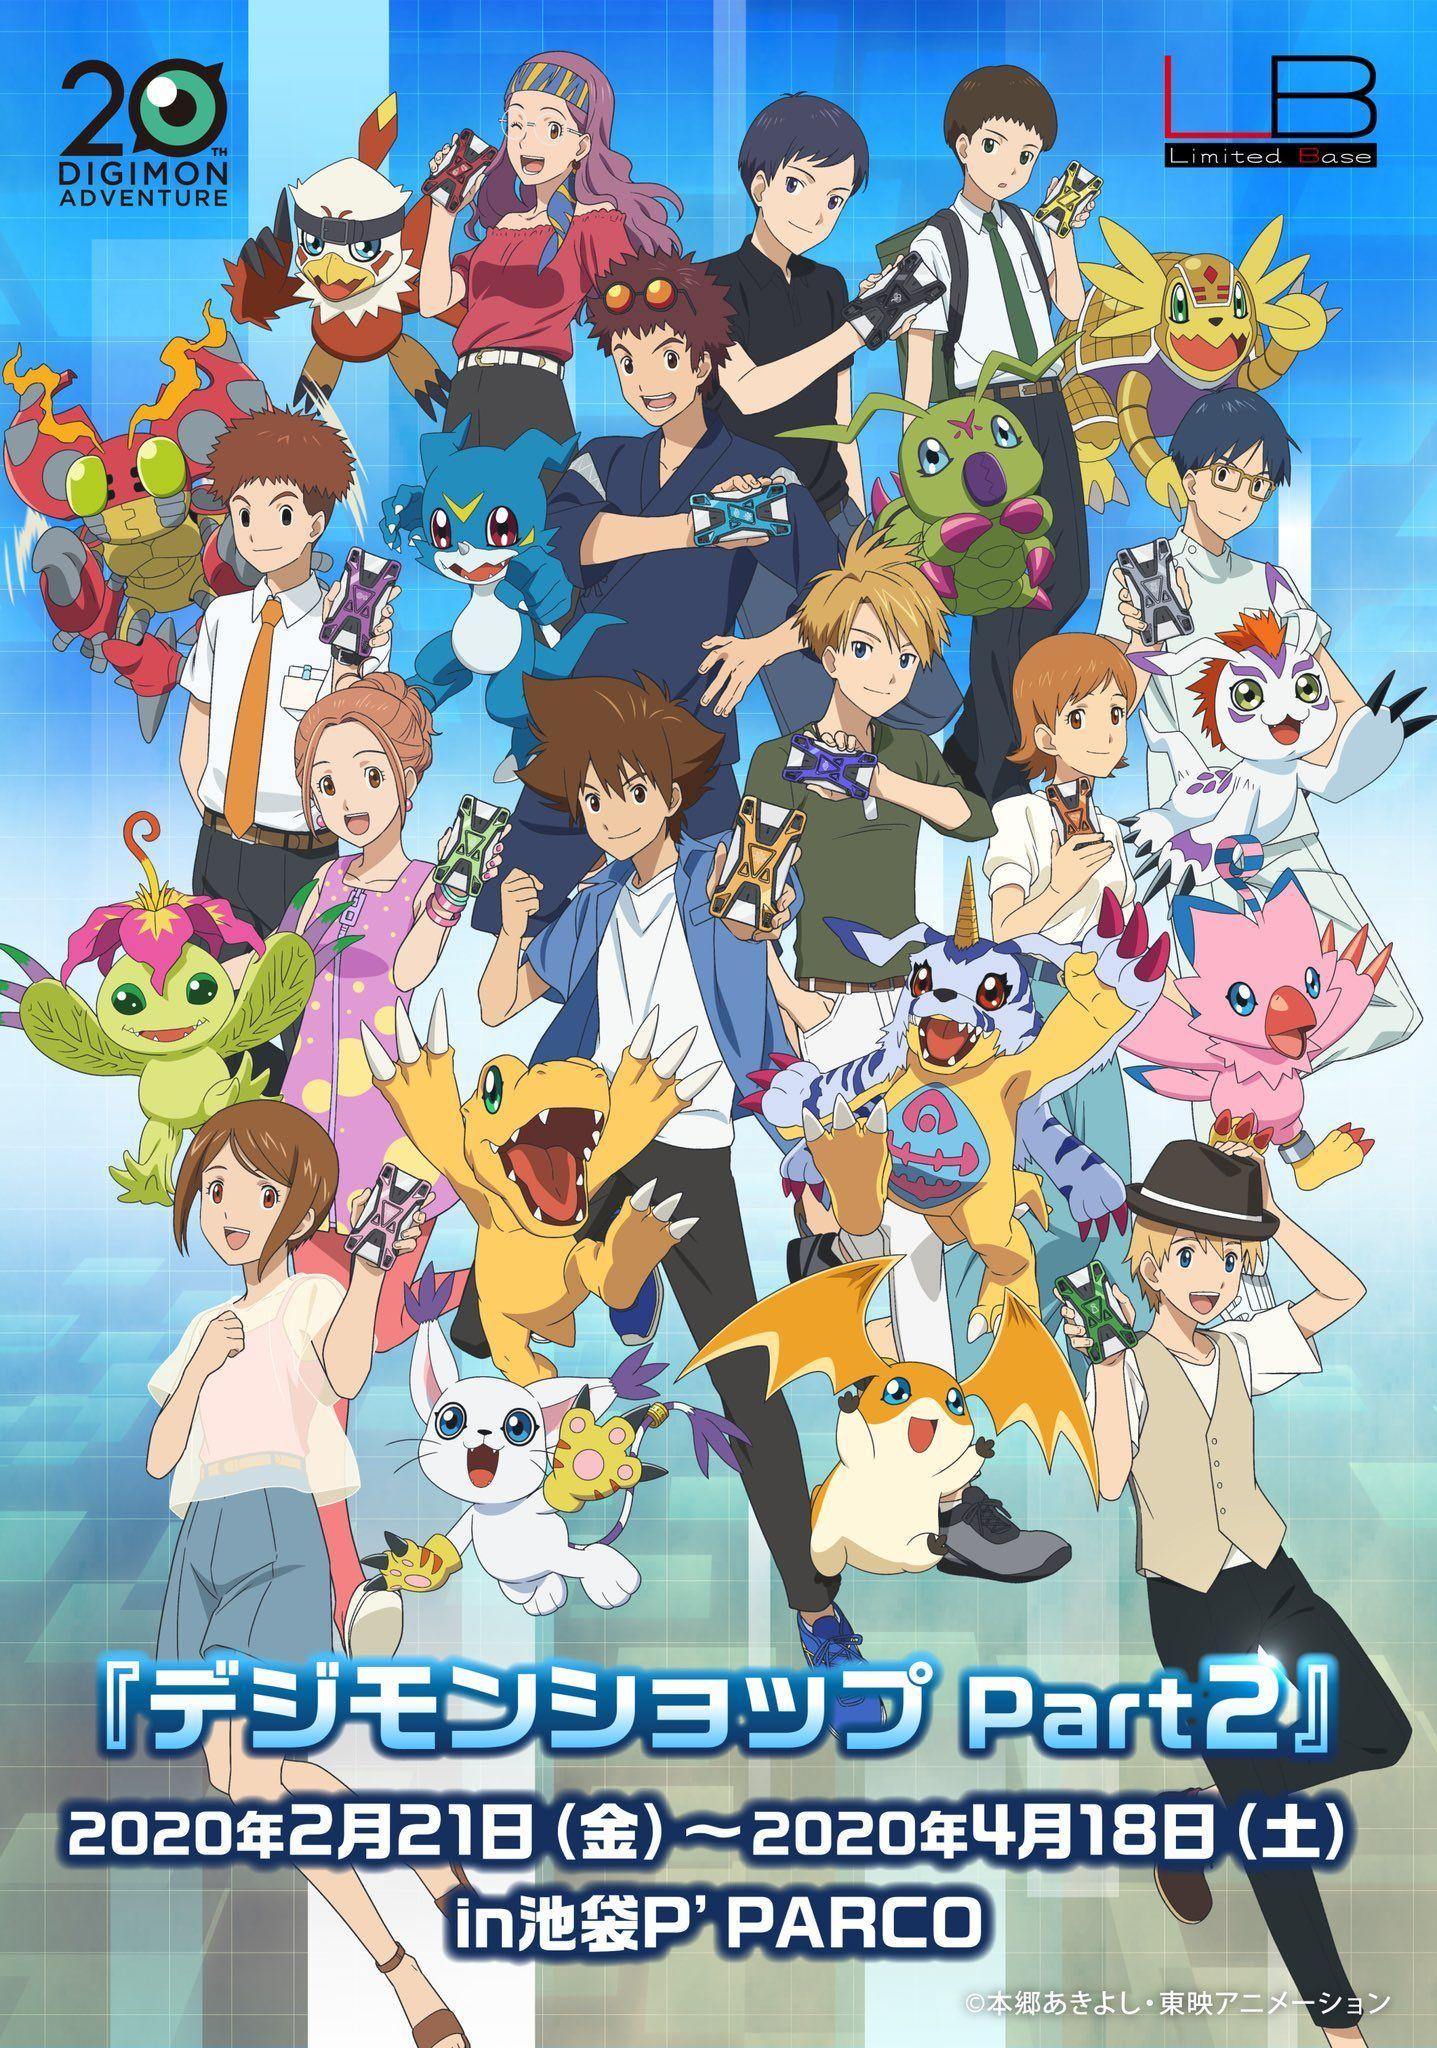 Digimon Adventure Last Evolution Kizuna Follow For More Skycne Twitter Pinterest Mira Digimon Adventure Last E Digimon Adventure Digimon Digimon Emblemas